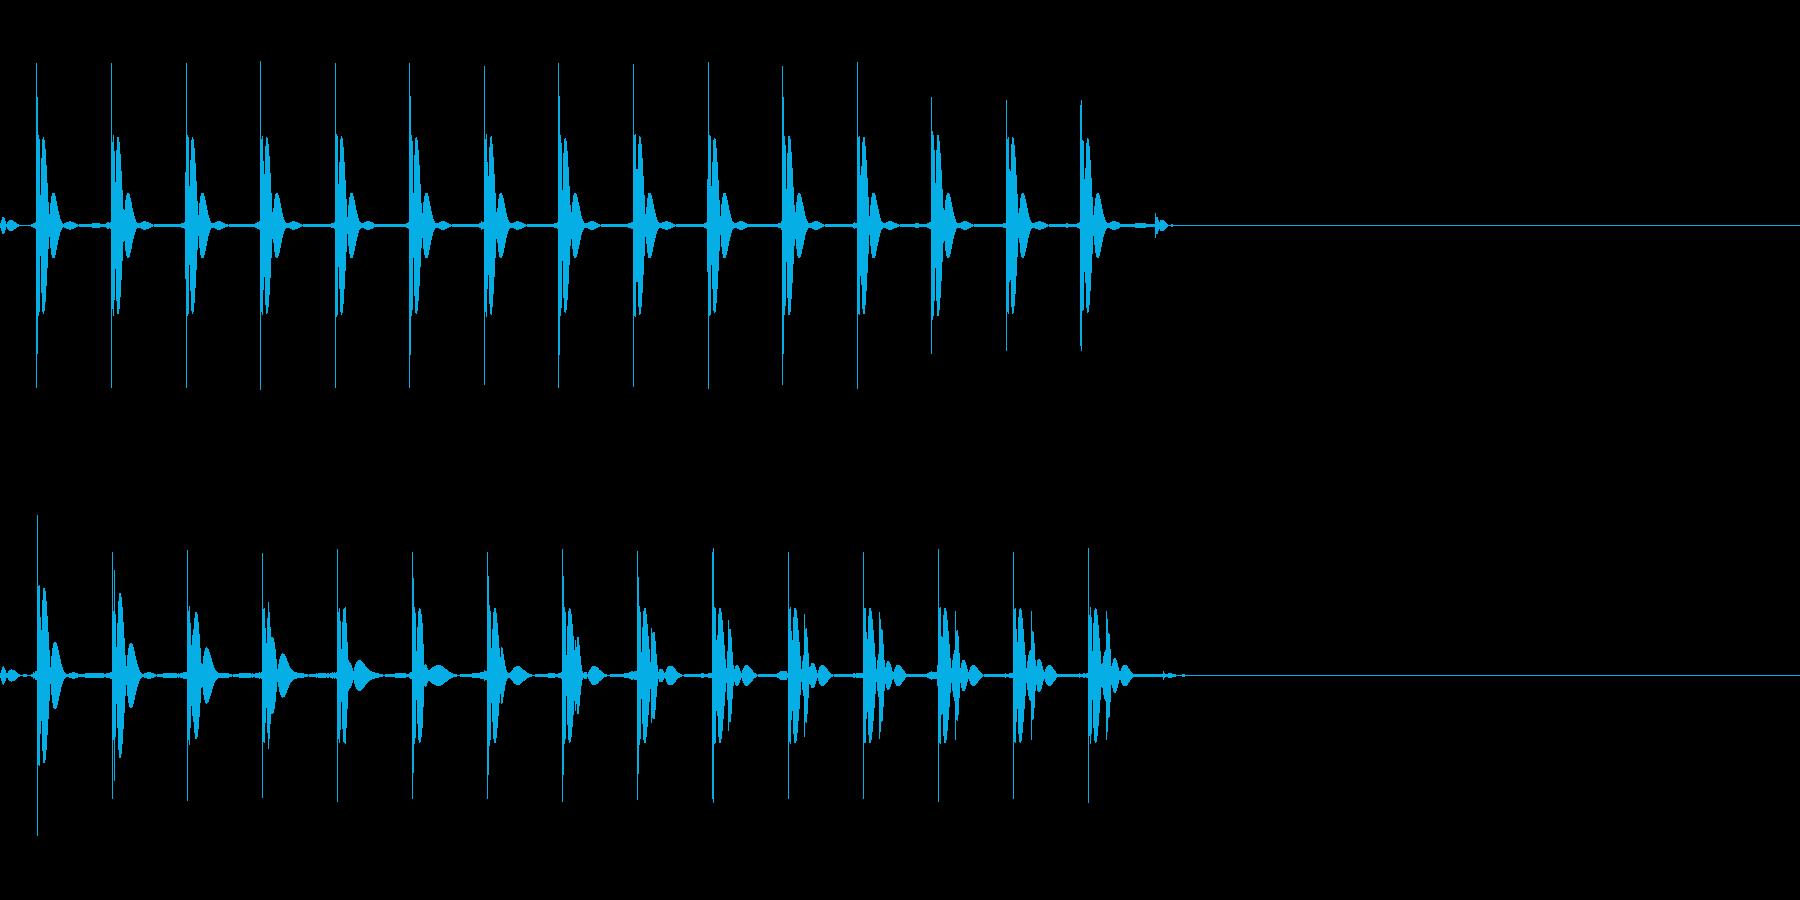 【SE 効果音】マシンガンの再生済みの波形